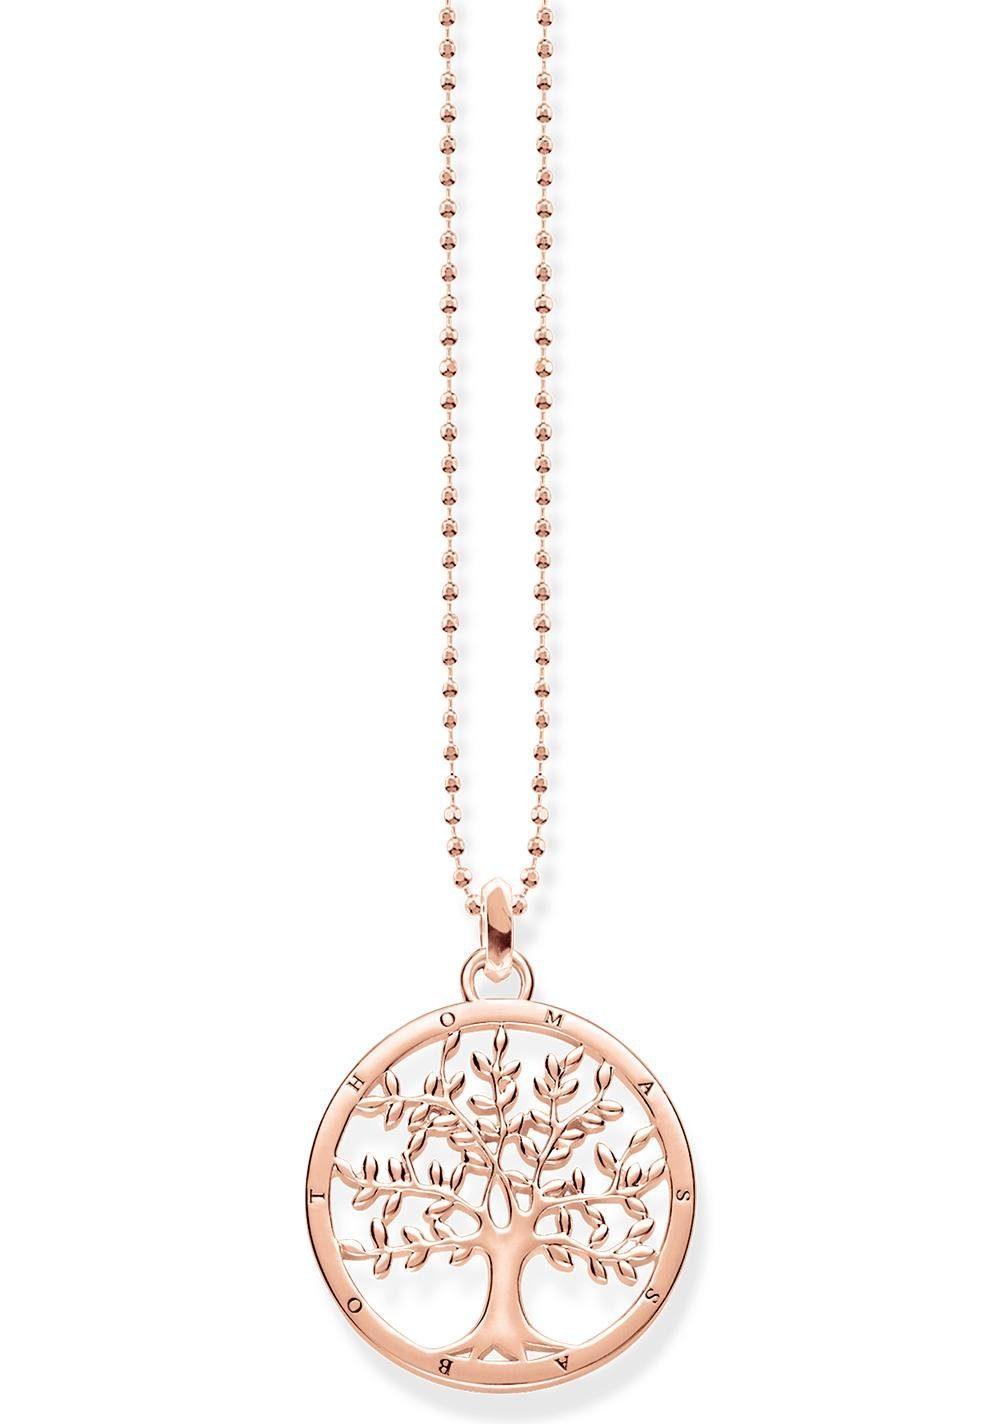 THOMAS SABO Kette mit Anhänger »Tree of Love, KE1660-415-40-L45v«